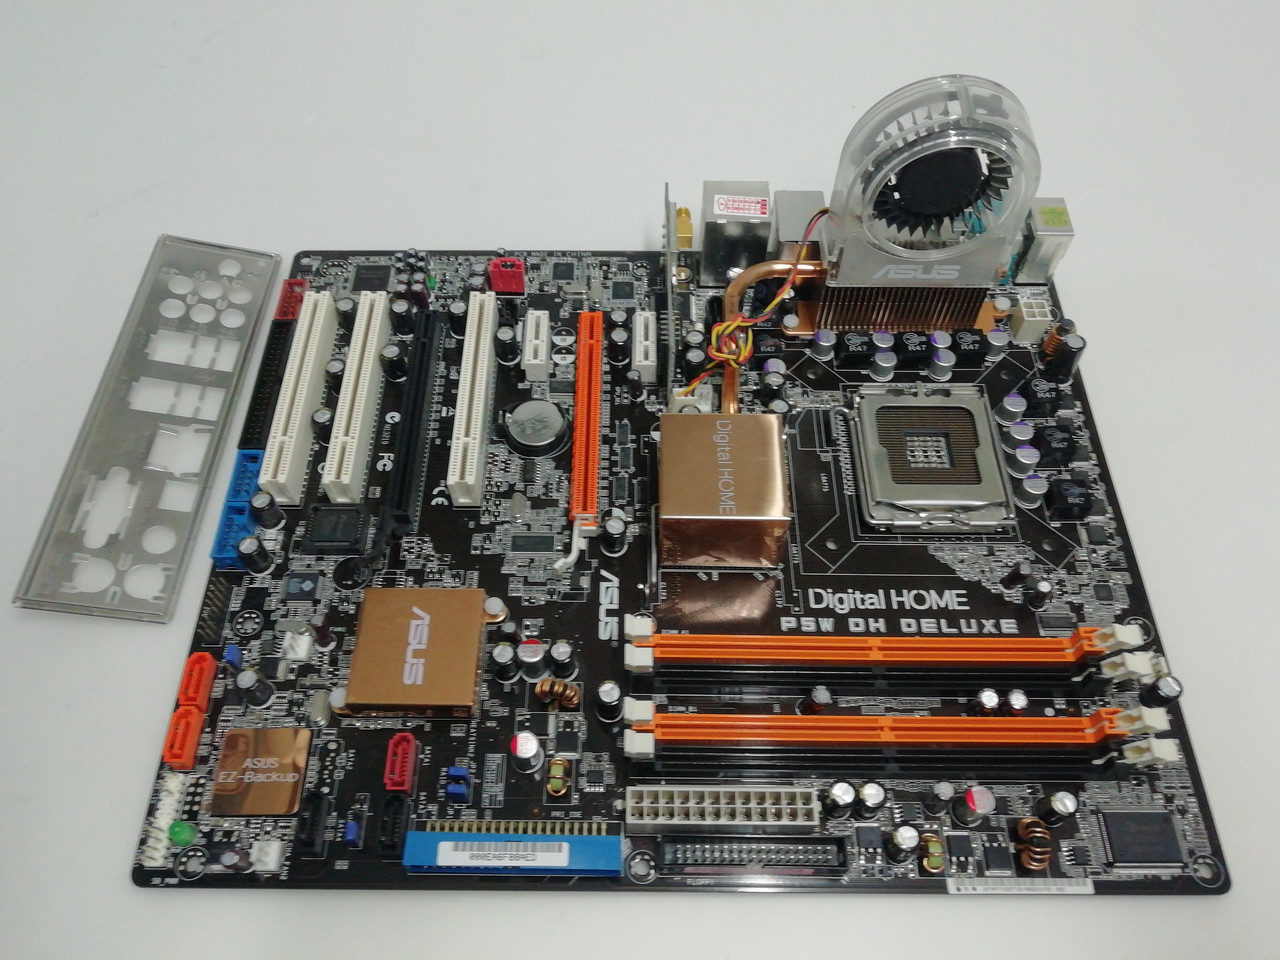 Материнская плата Asus P5W DH Deluxe WiFI (s775, i975X, PCI-Ex16, CF)